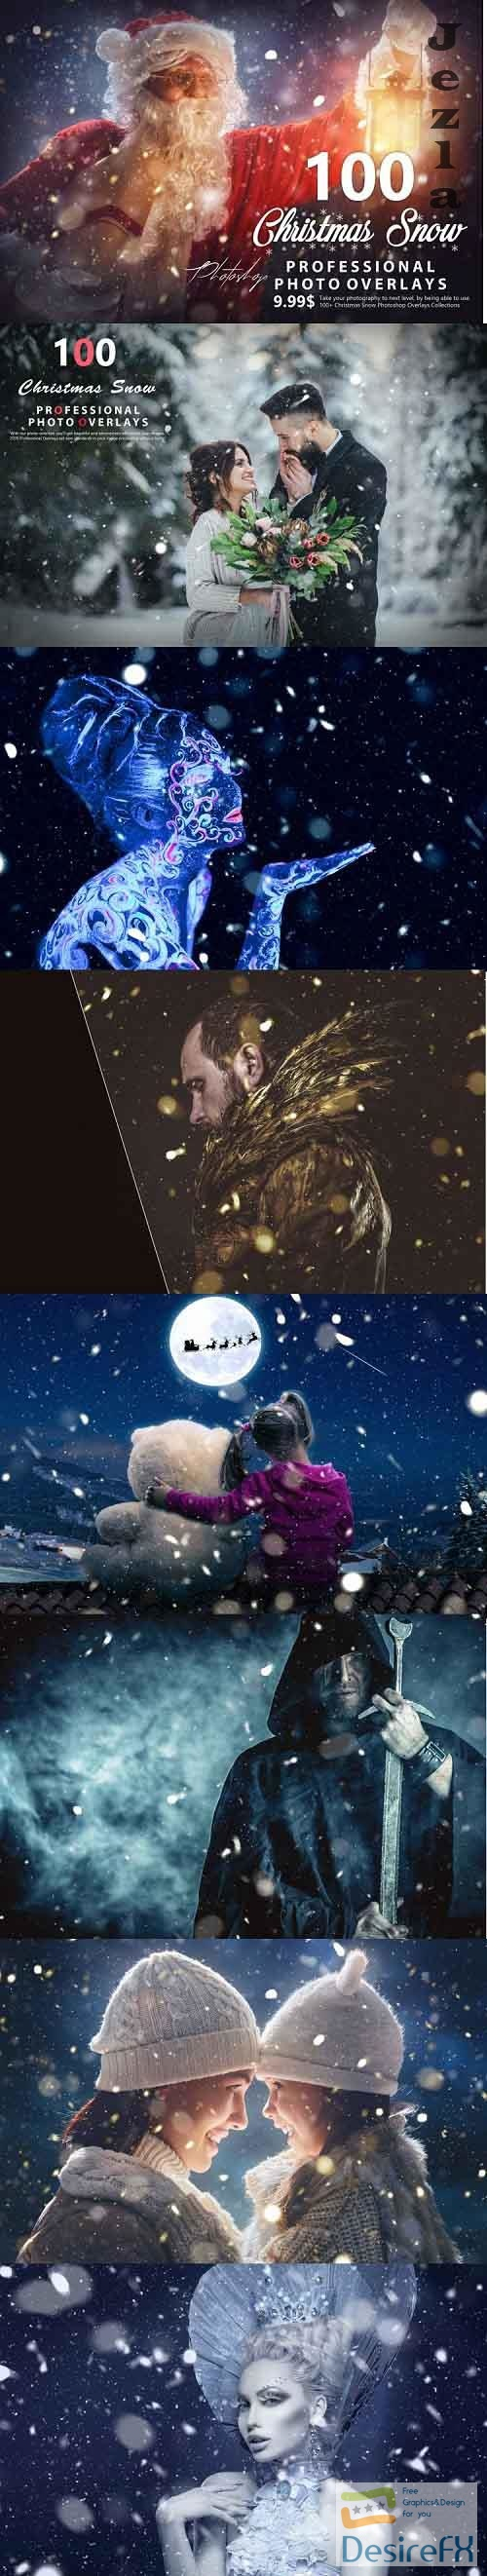 100 Christmas Snow Photo Overlays - 992776